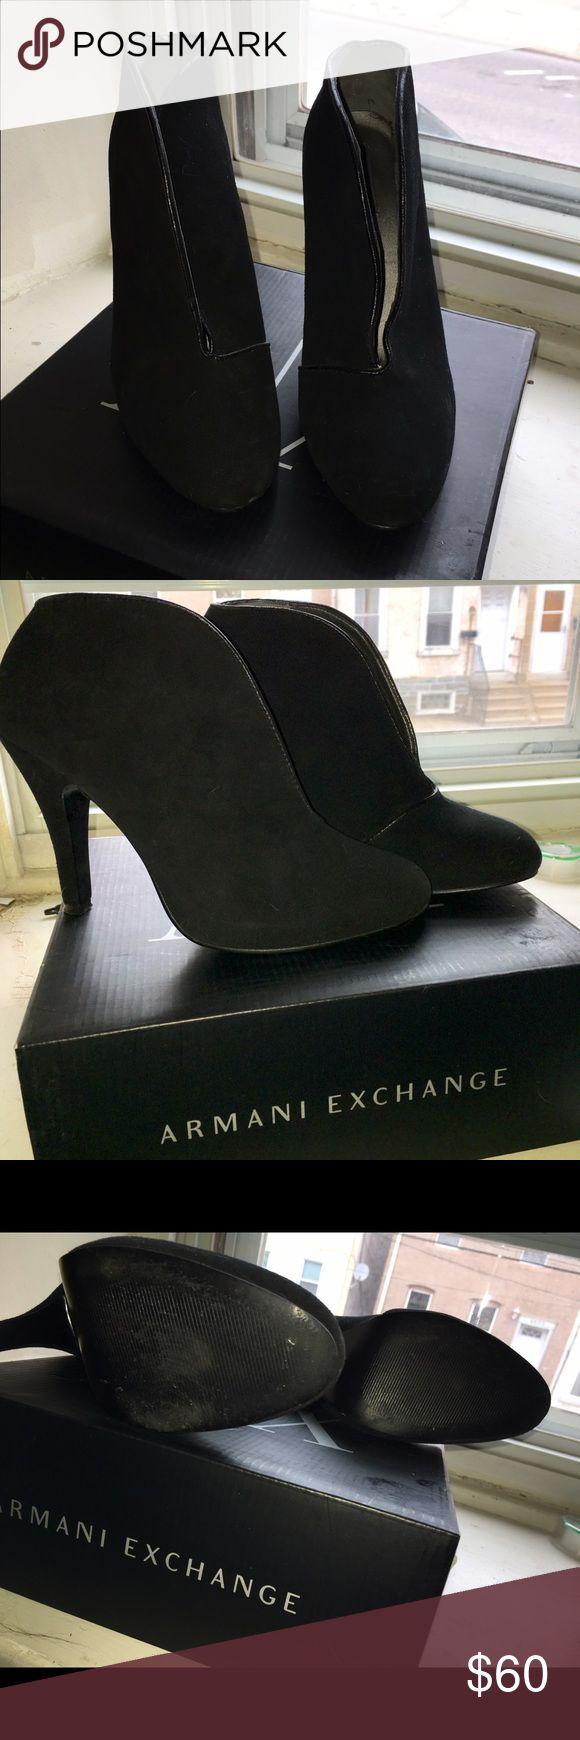 Armani exchange heels Worn twice. In excellent condition Armani Exchange Shoes Heels